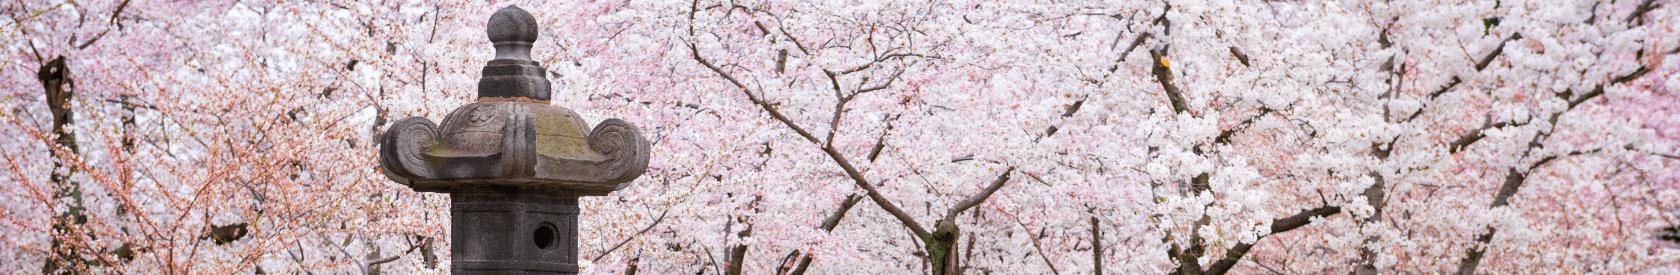 Mrs. Taft Plants a Tree: How the Cherry Blossoms Came to Washington